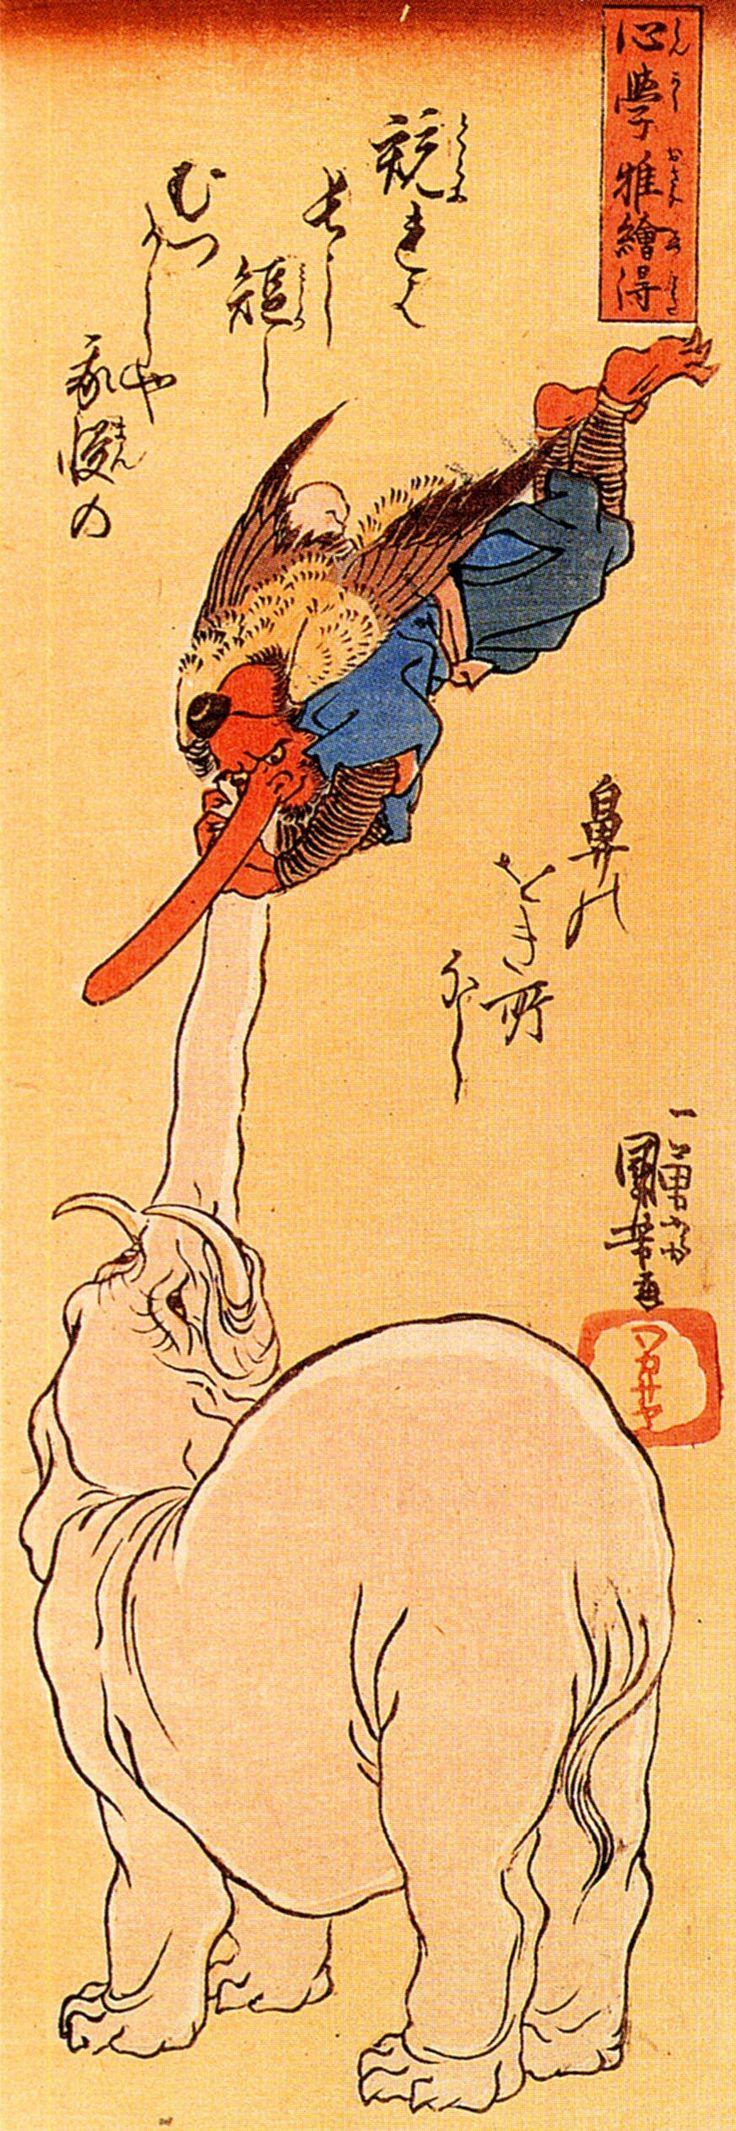 Elephant catching a flying Tengu, ca.1800s by Utagawa Kuniyoshi, Japan